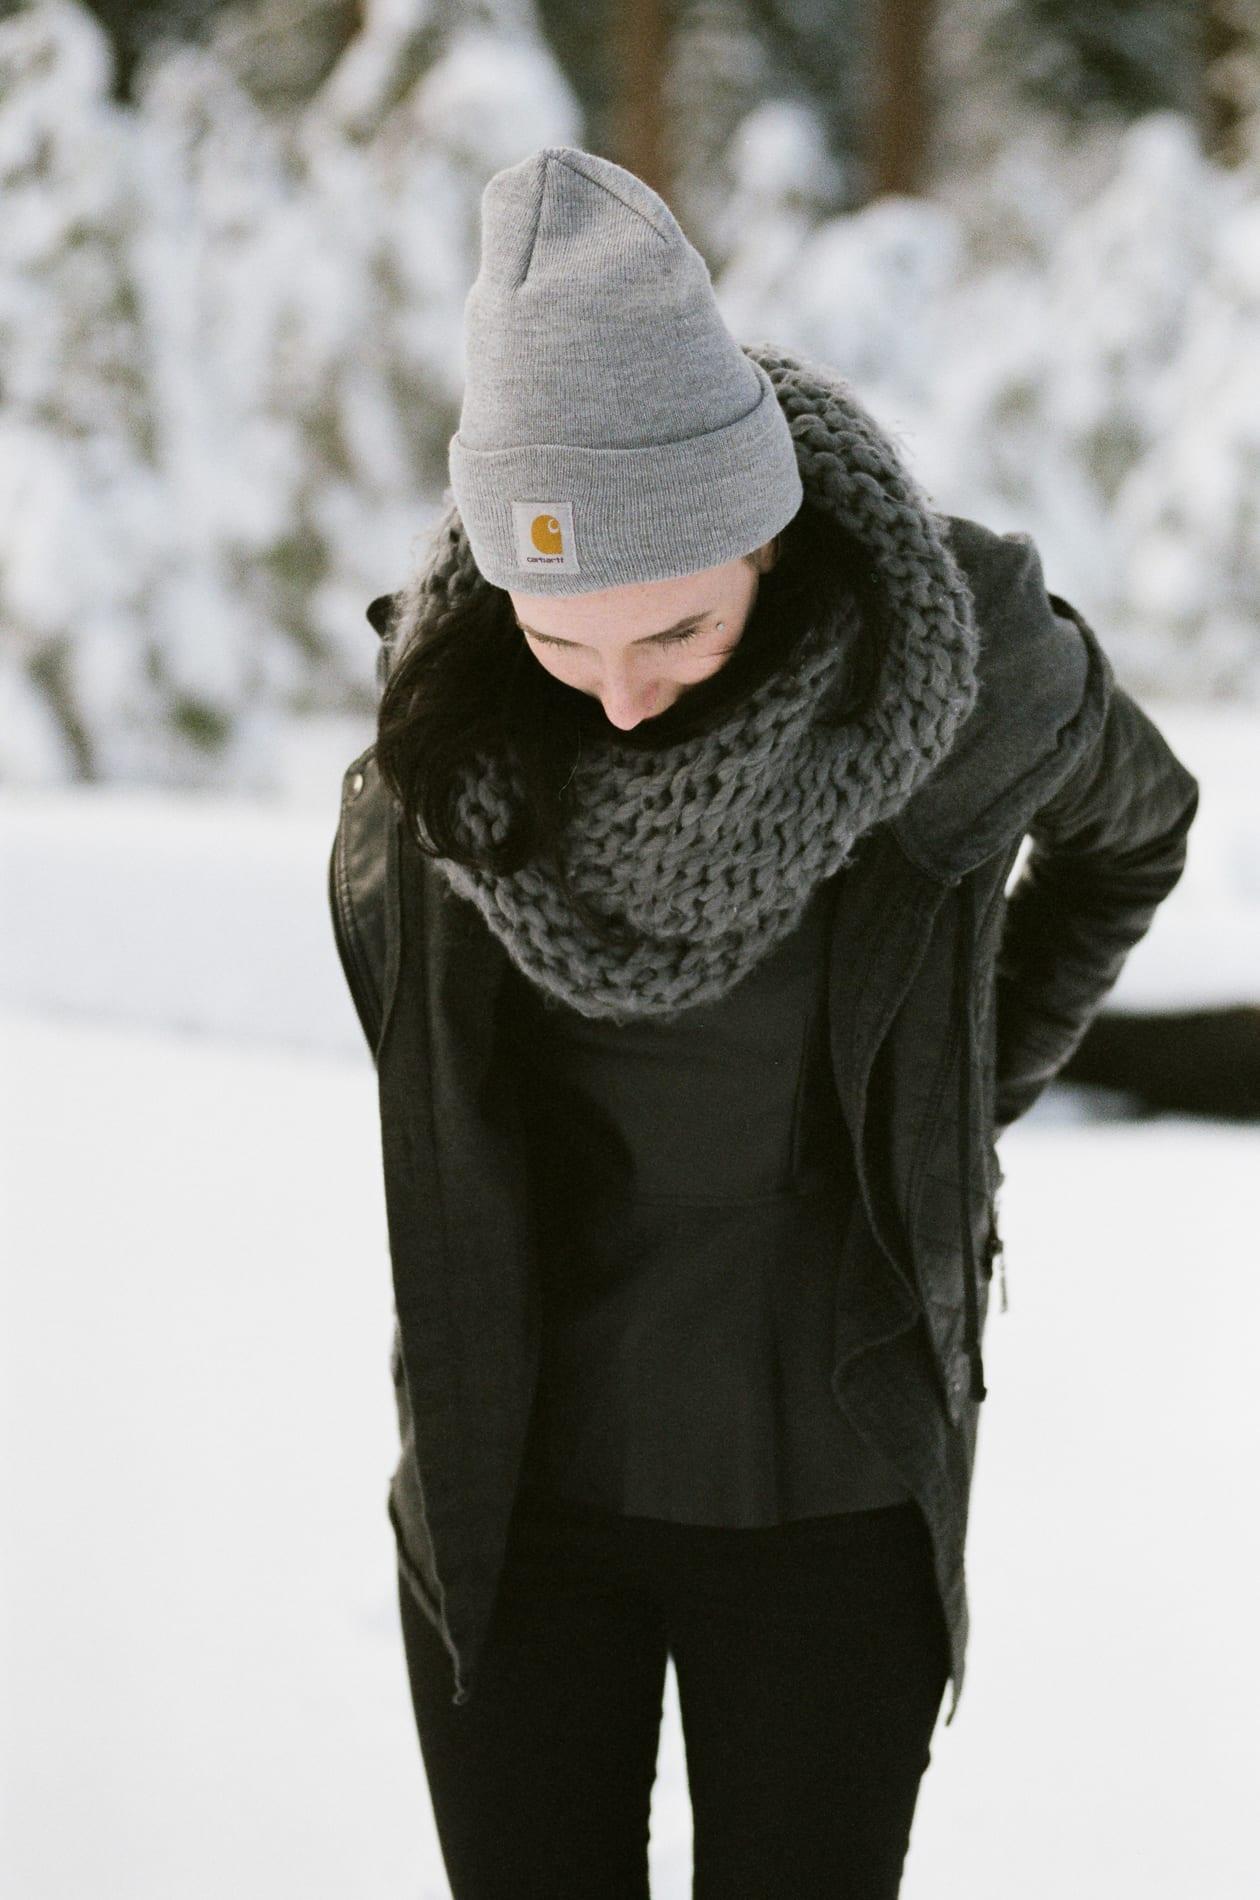 mt-lassen-winter-snow-couples-photo-13